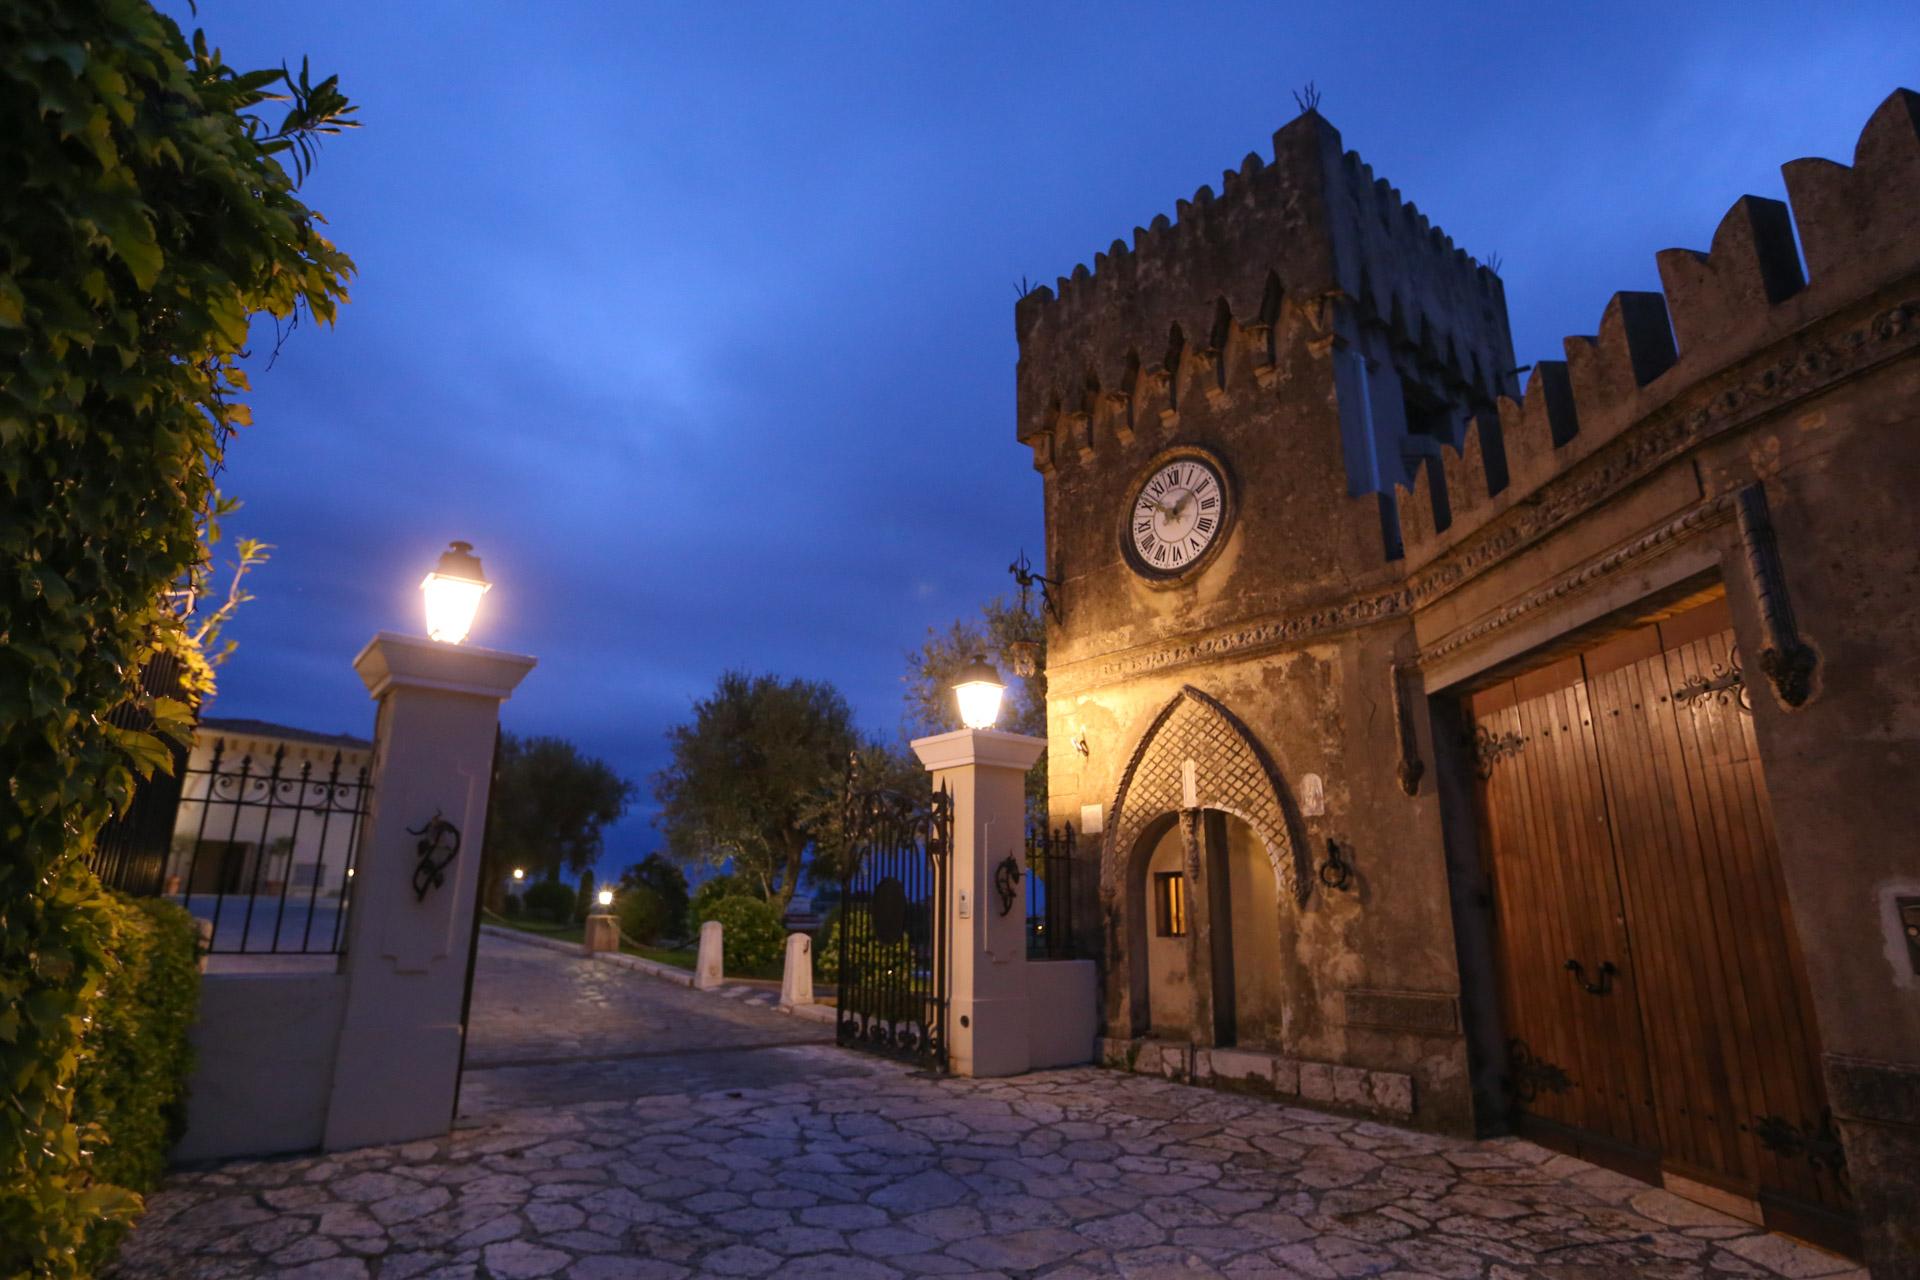 Entrance of the wine castel at dusk